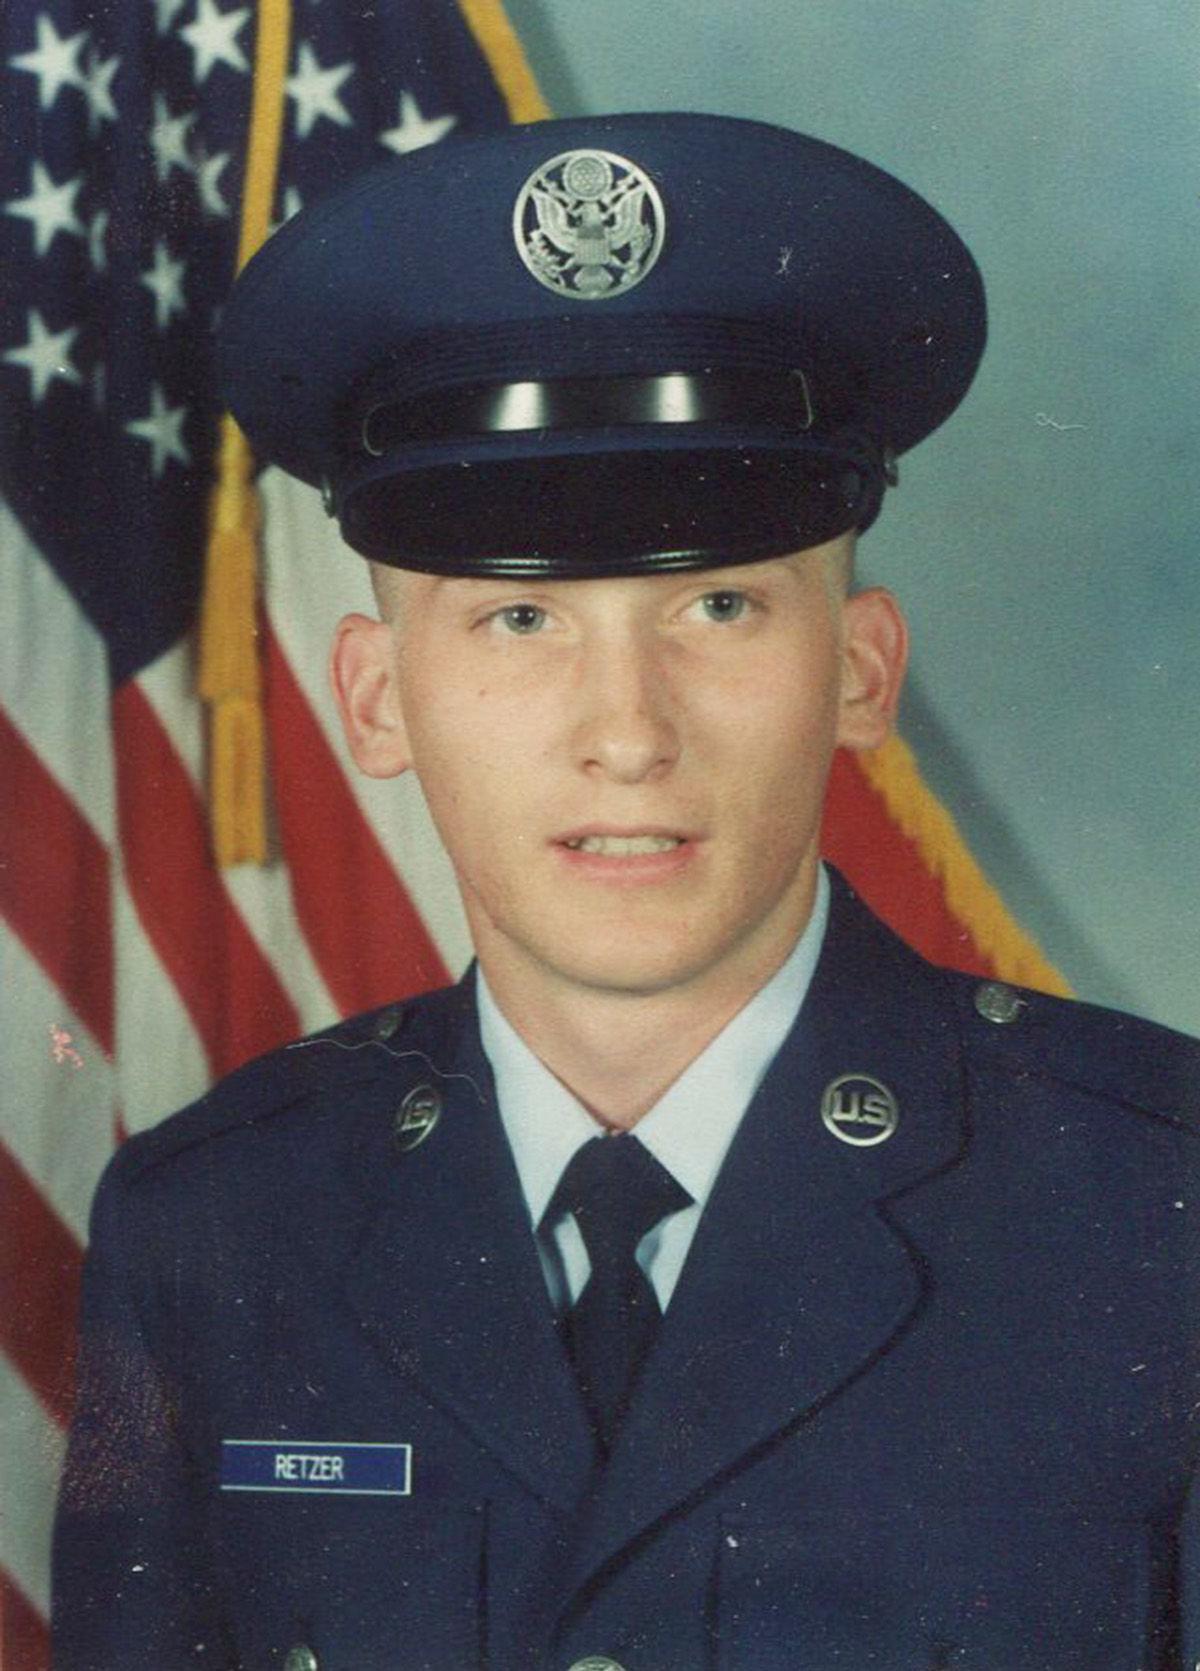 Ryan Retzer military photo.jpg